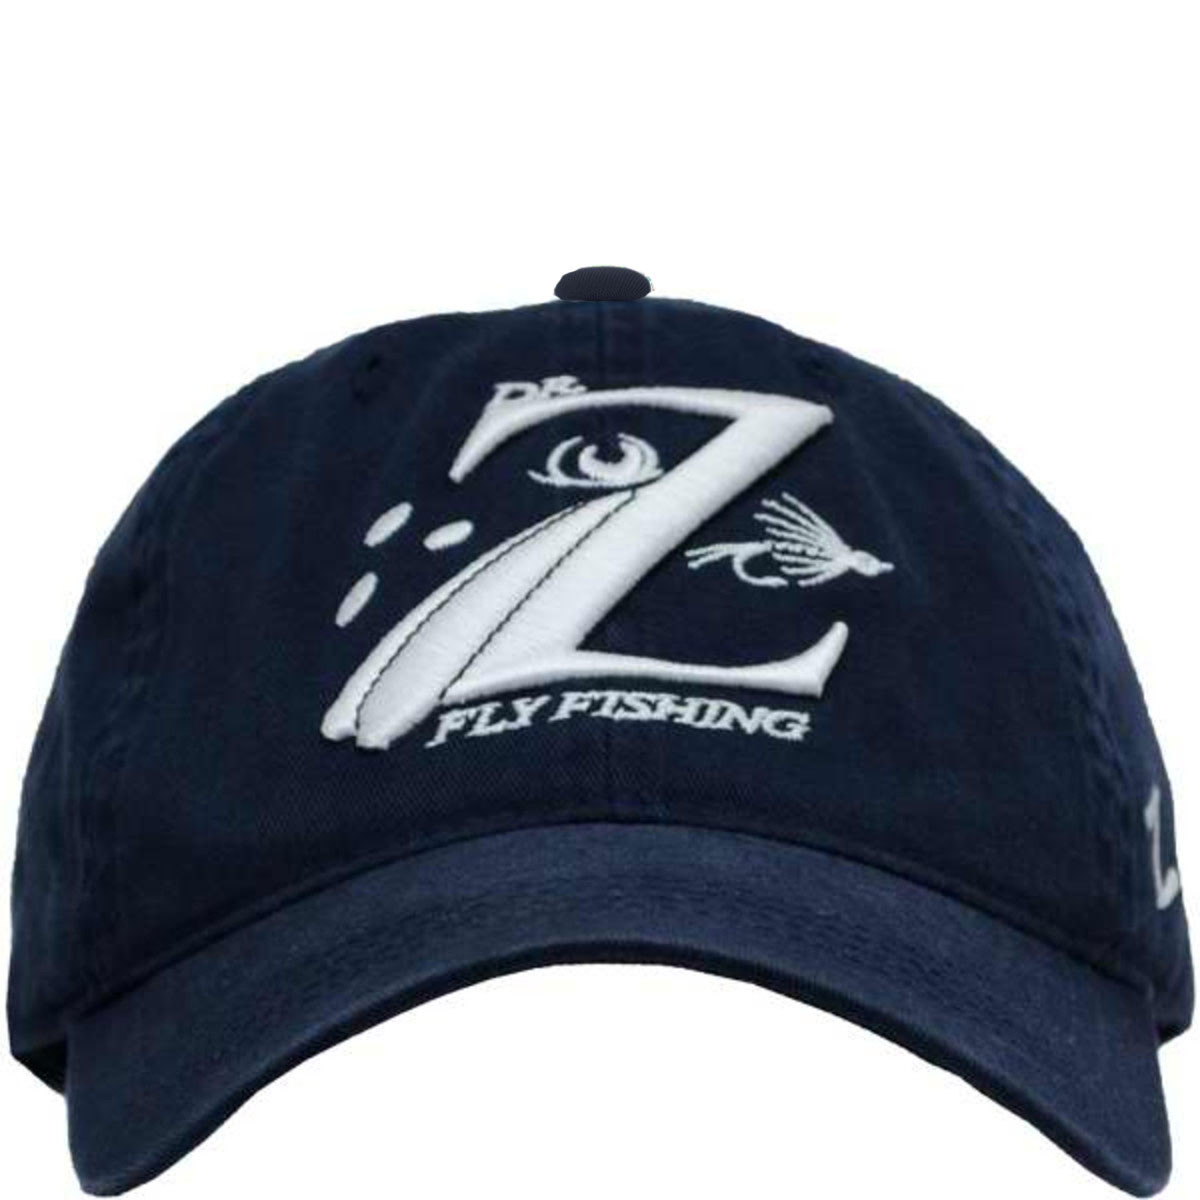 763f33273e8 BYU Fly Fishing